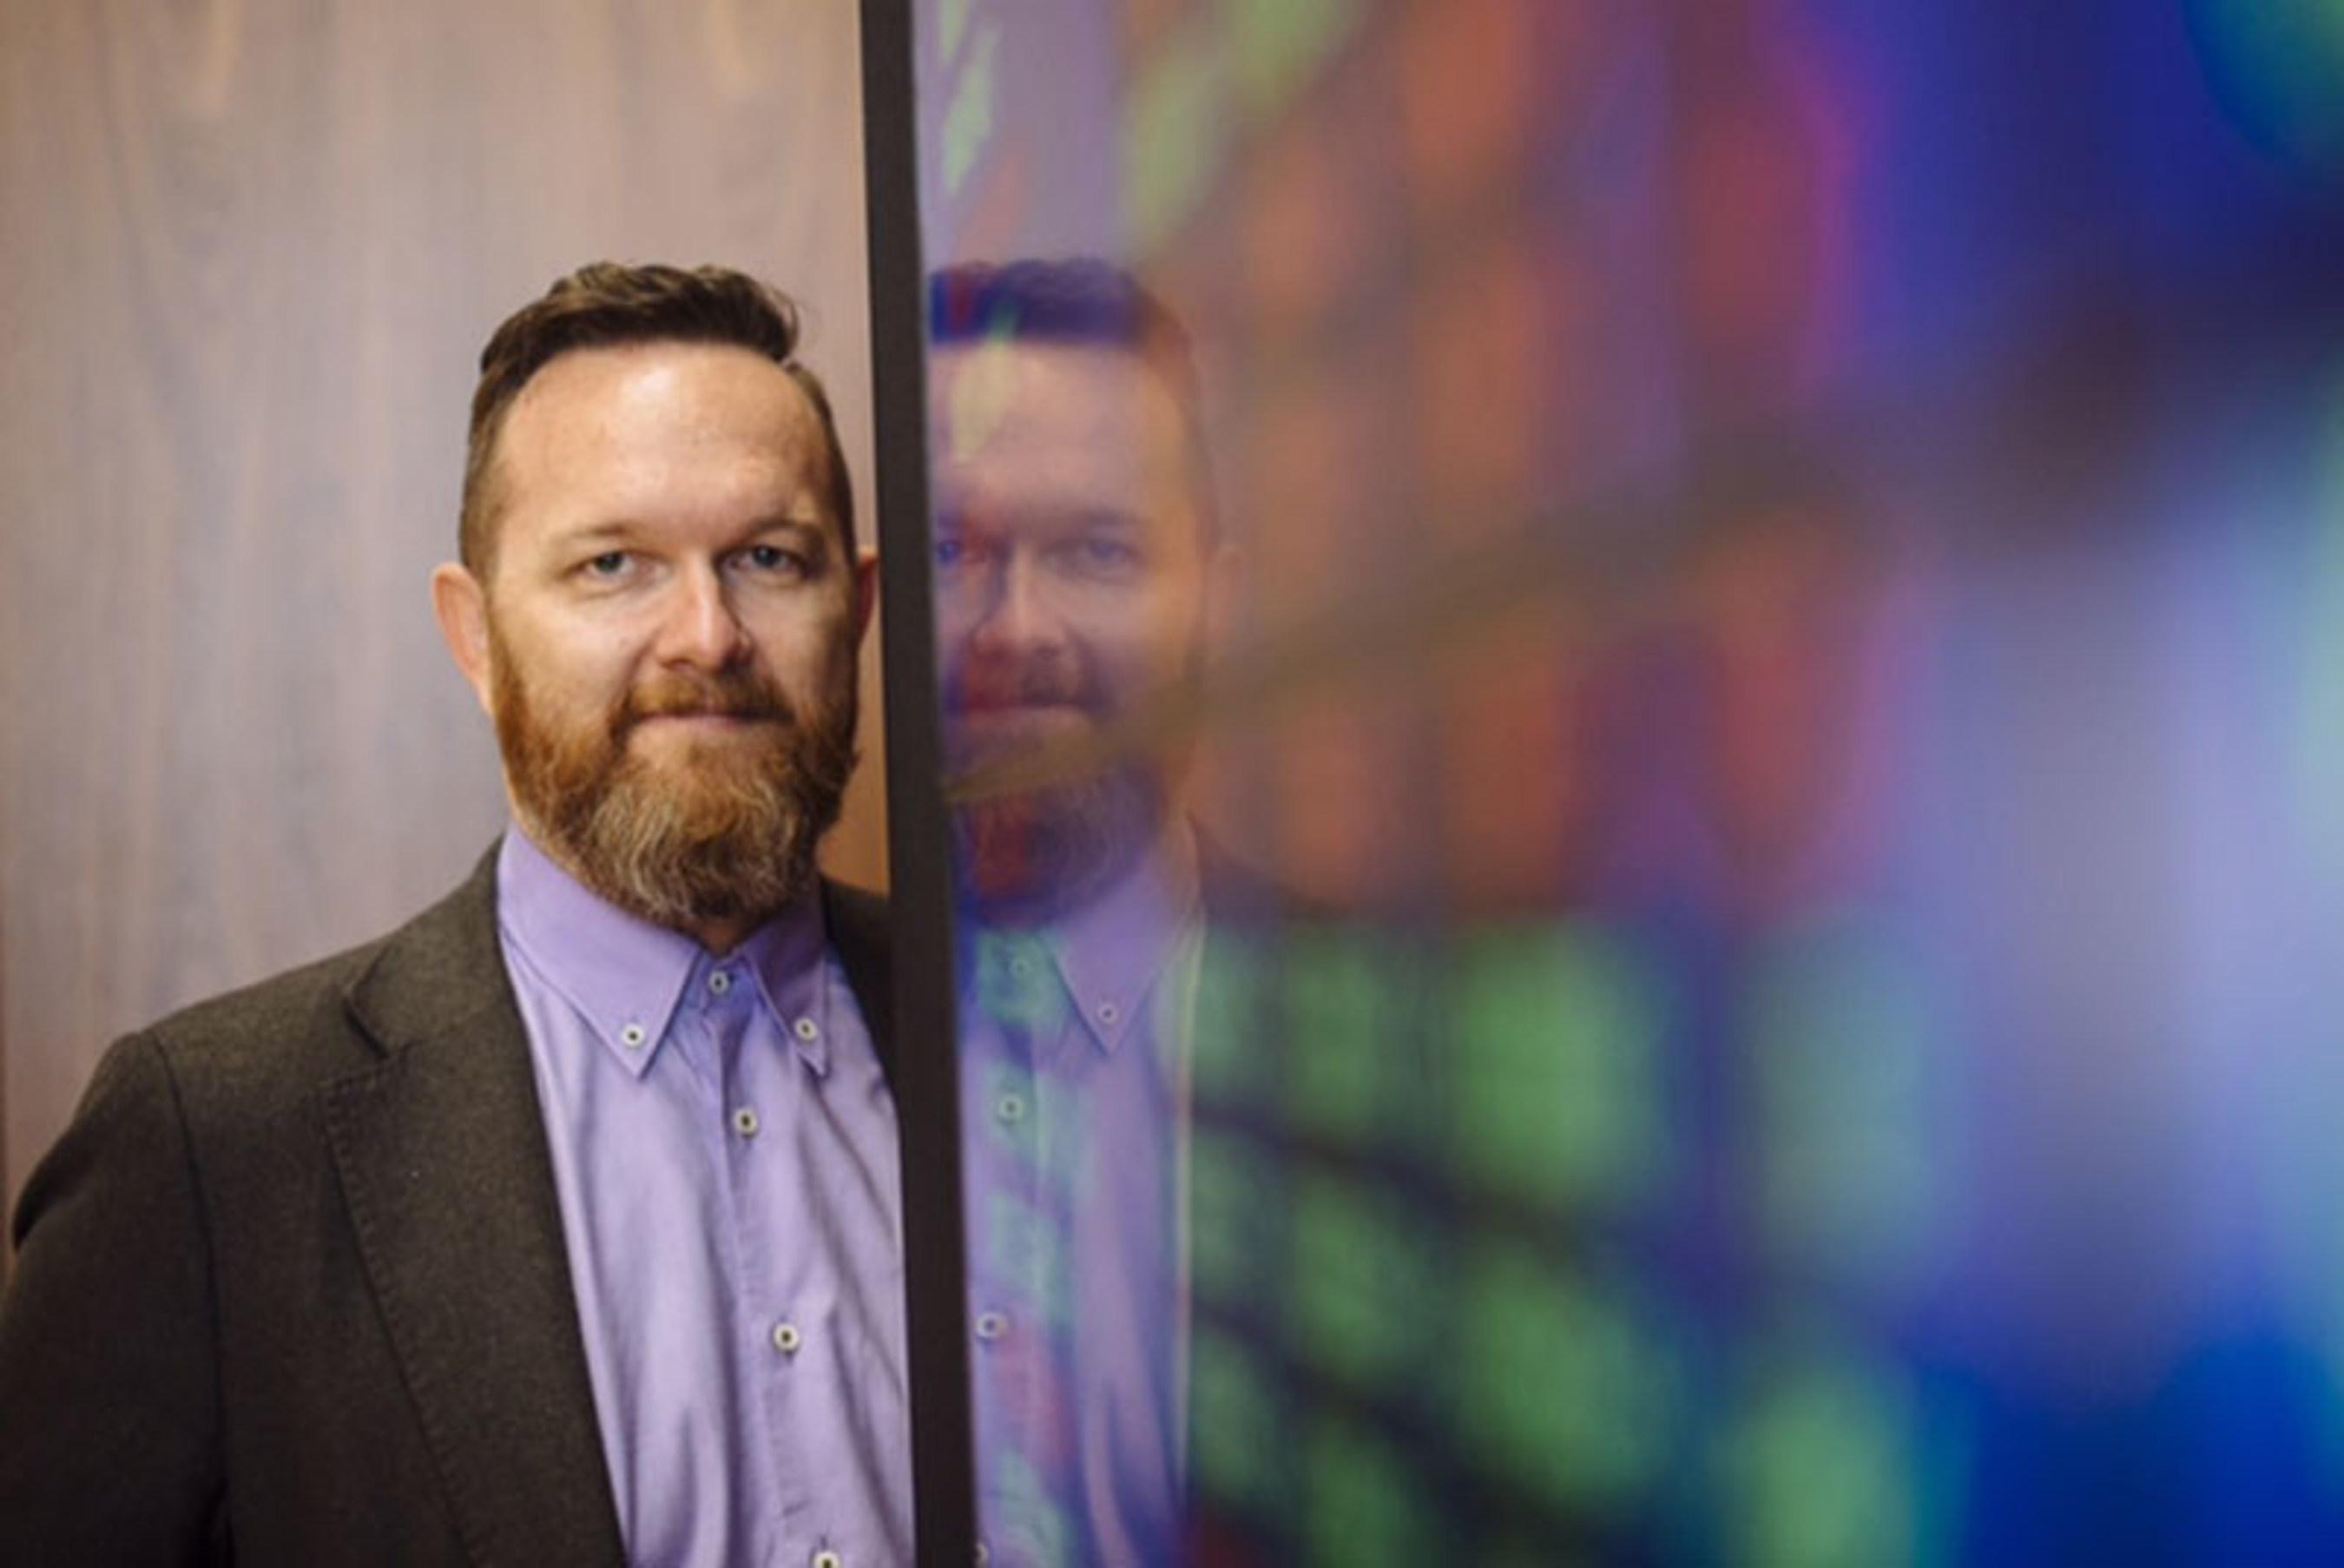 Denver Maddux, CEO, Megaport. Credit: Paul McMillan